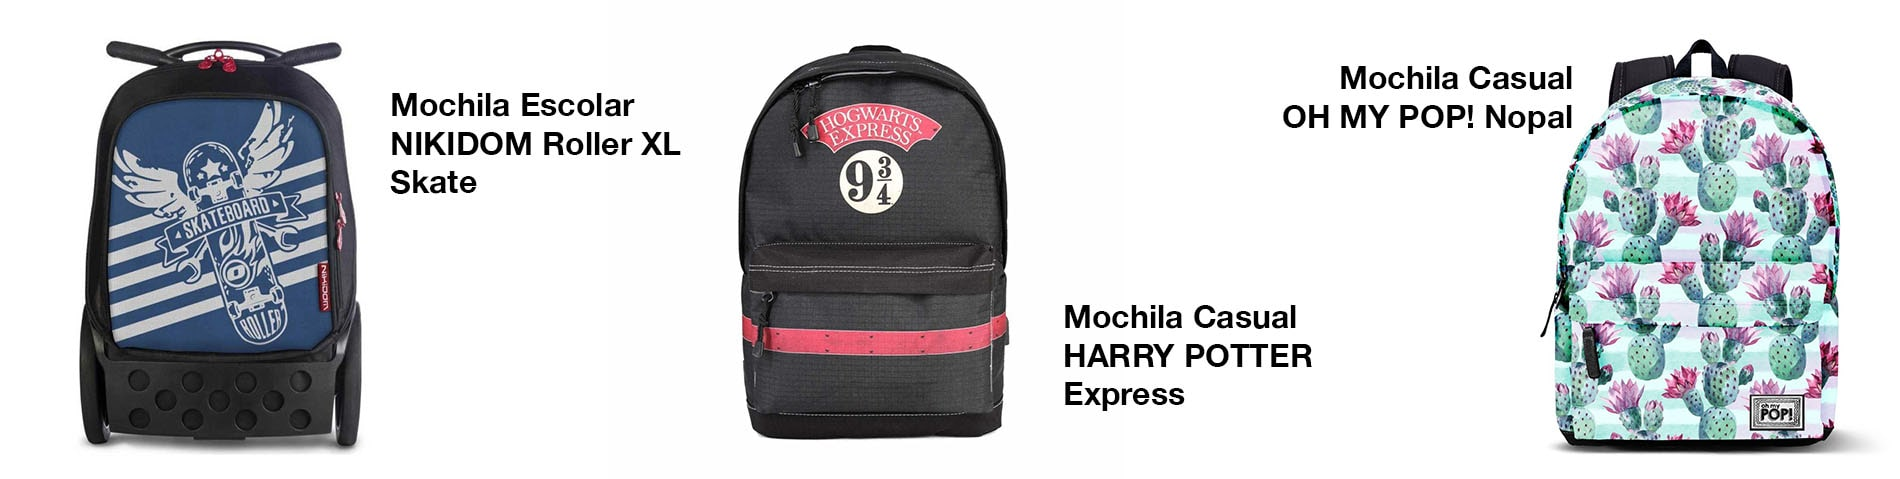 mochila_escolar